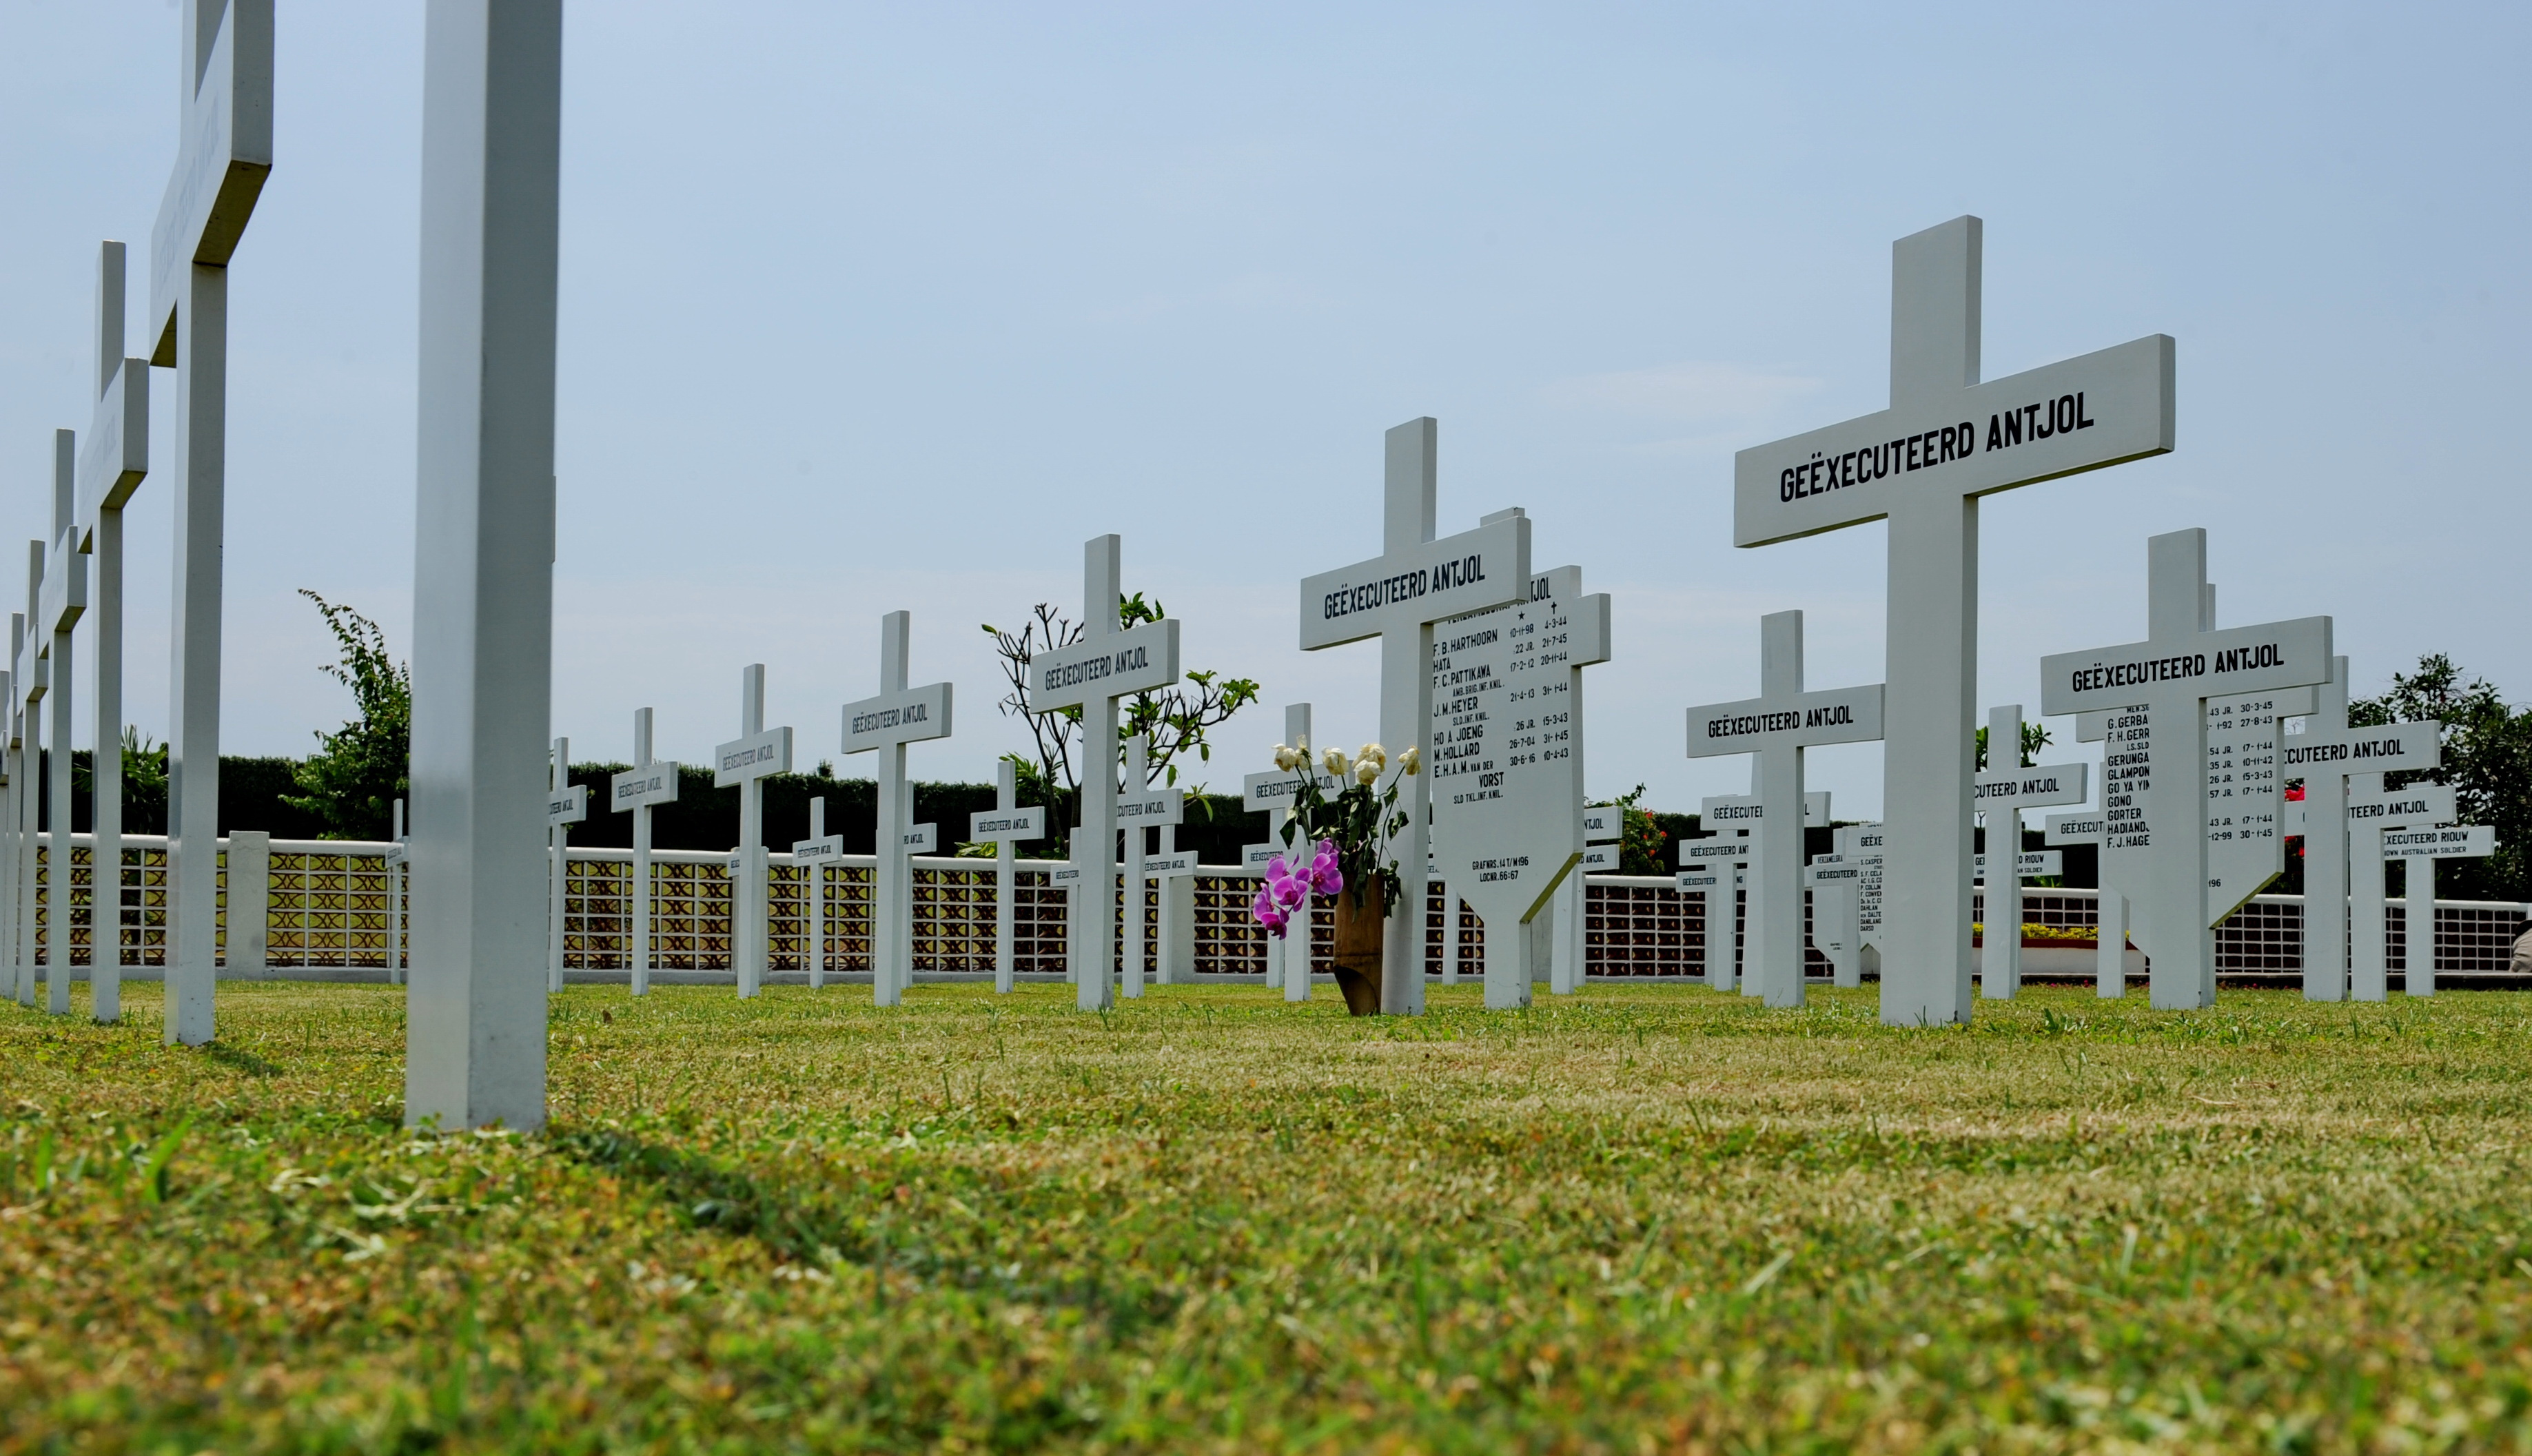 Gravestones of executived servicemen in Ancol. Photo Photo by P.H. van der Grinten